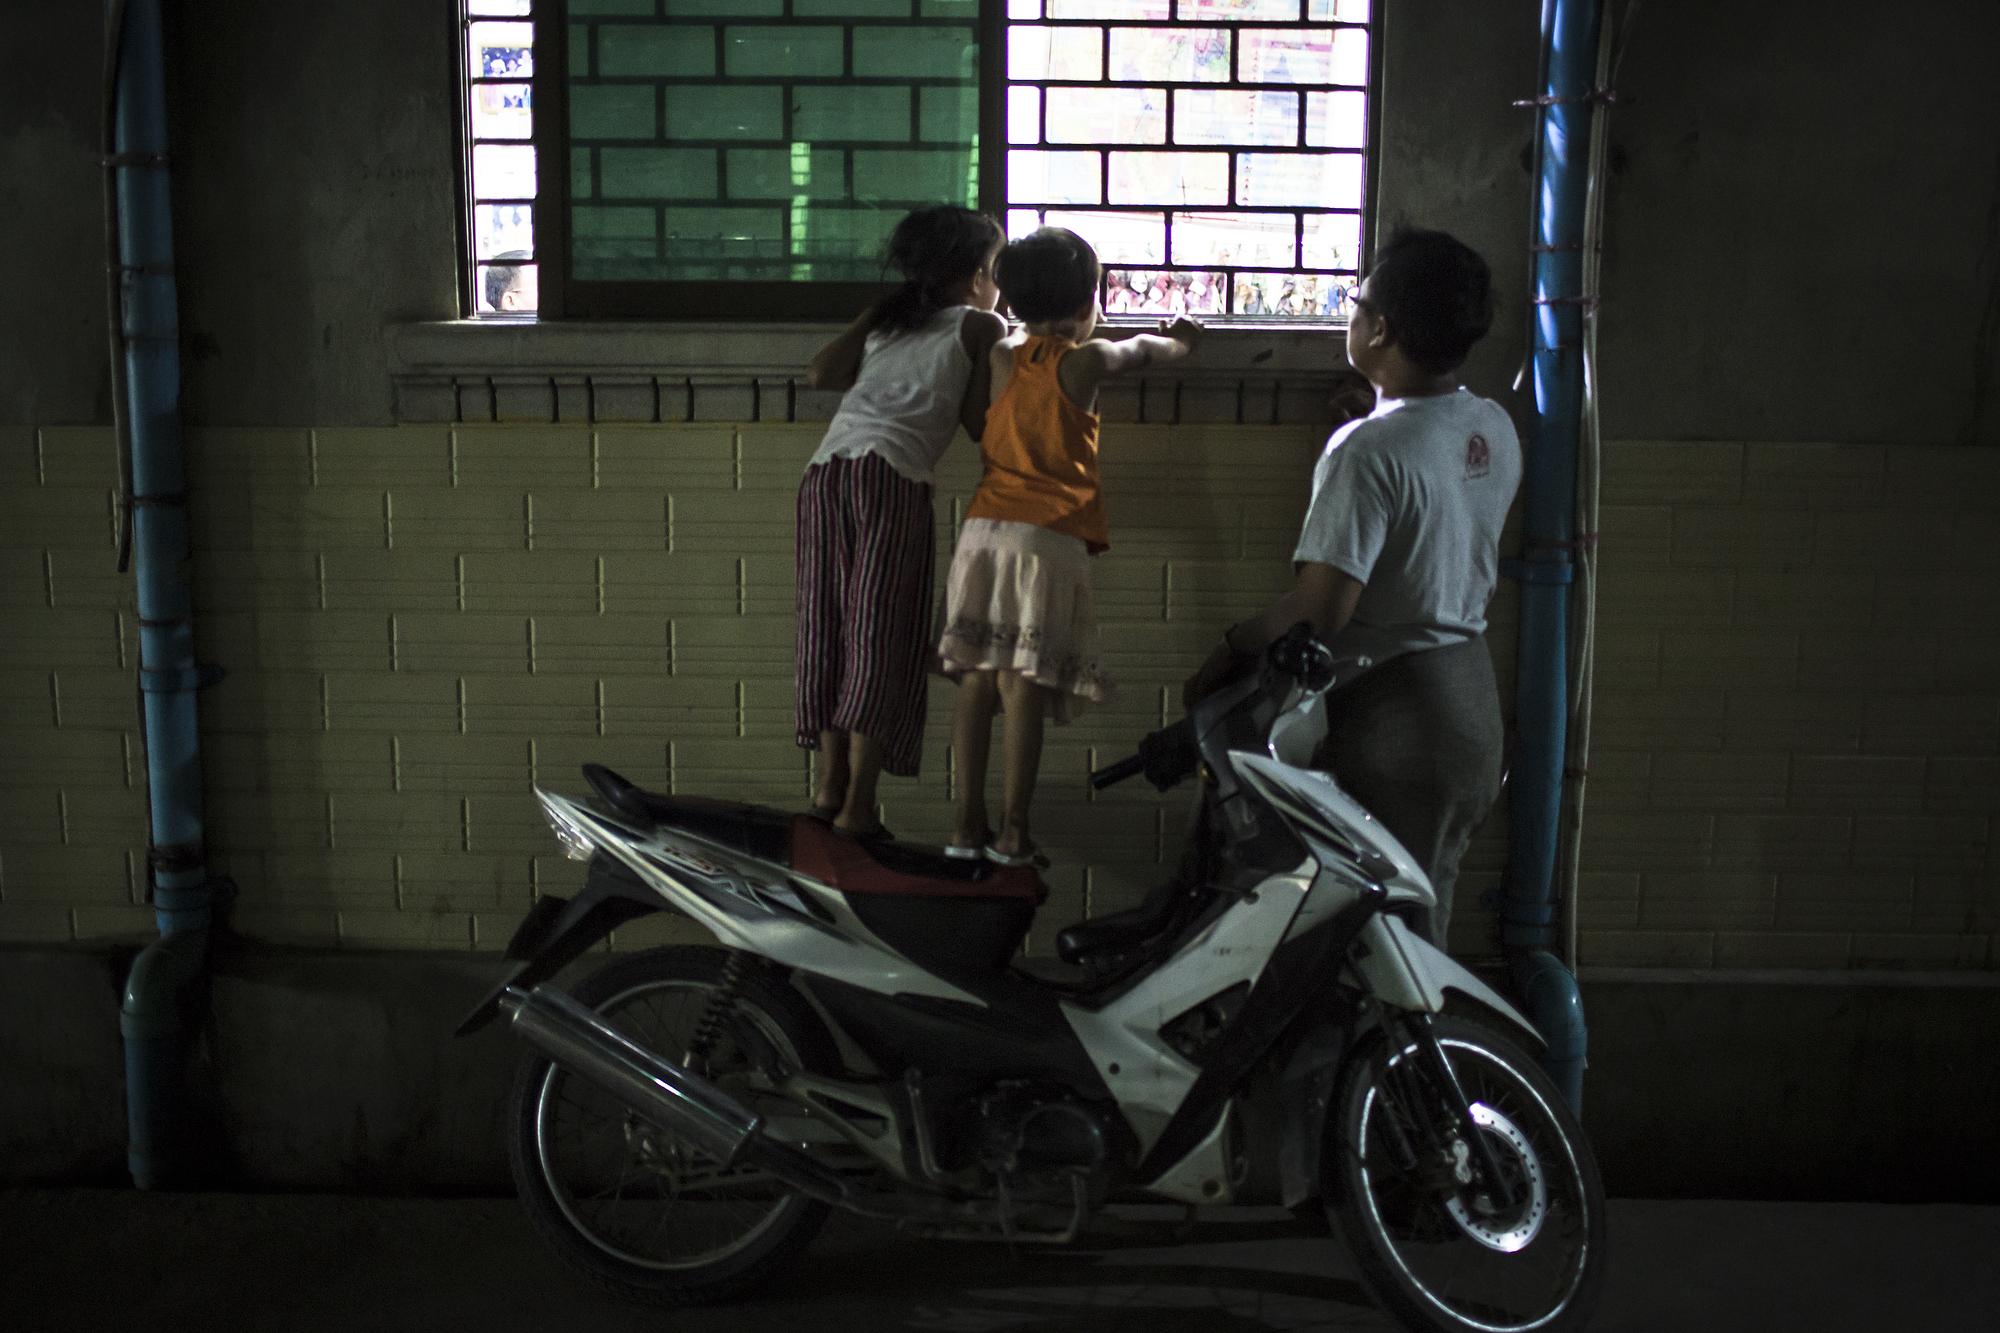 MW_Myanmar_Moustache_Brothers_1780_edit.jpg